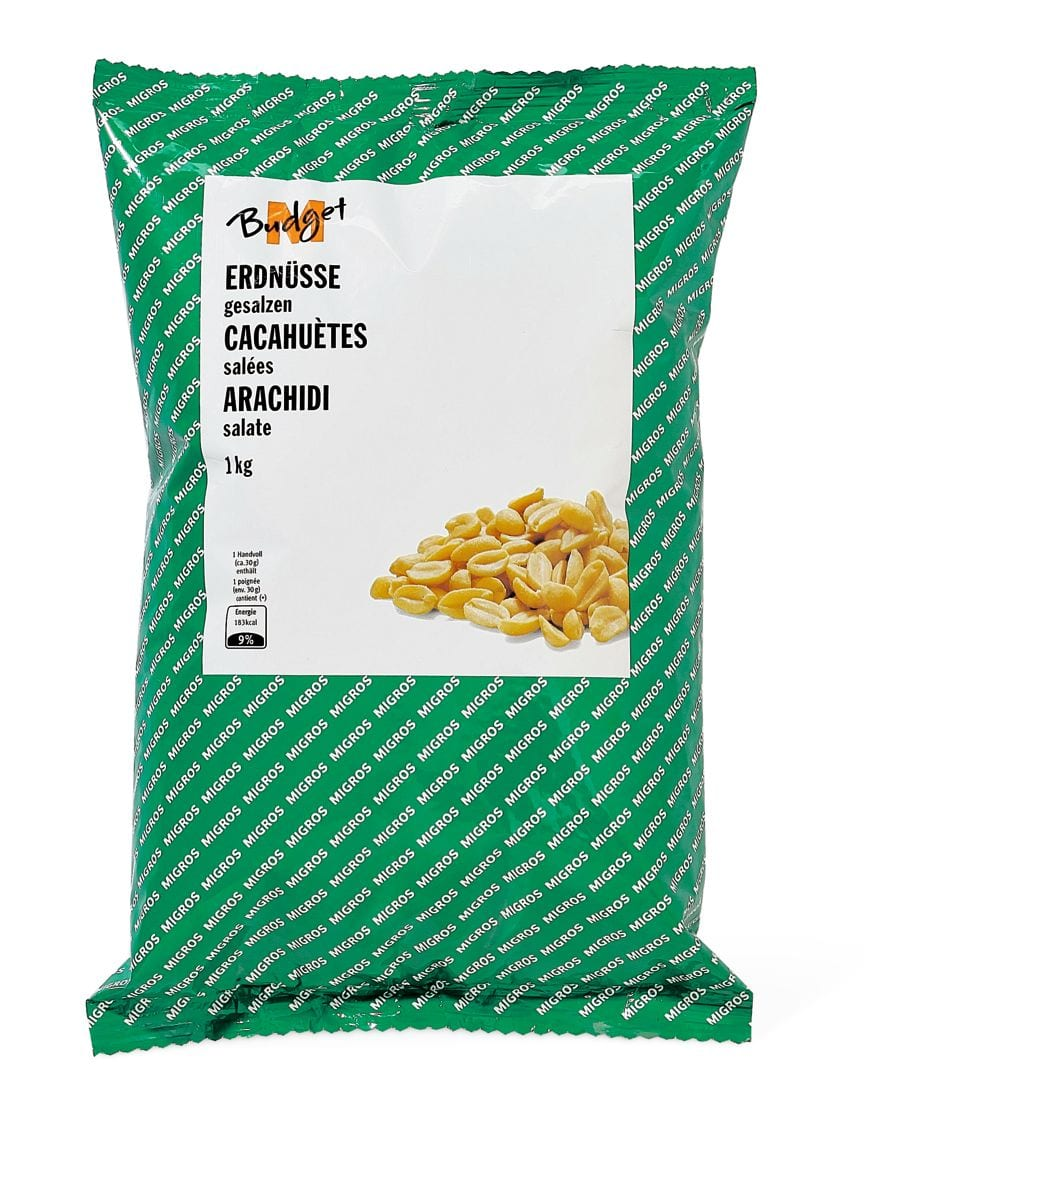 M-Budget Arachidi salate